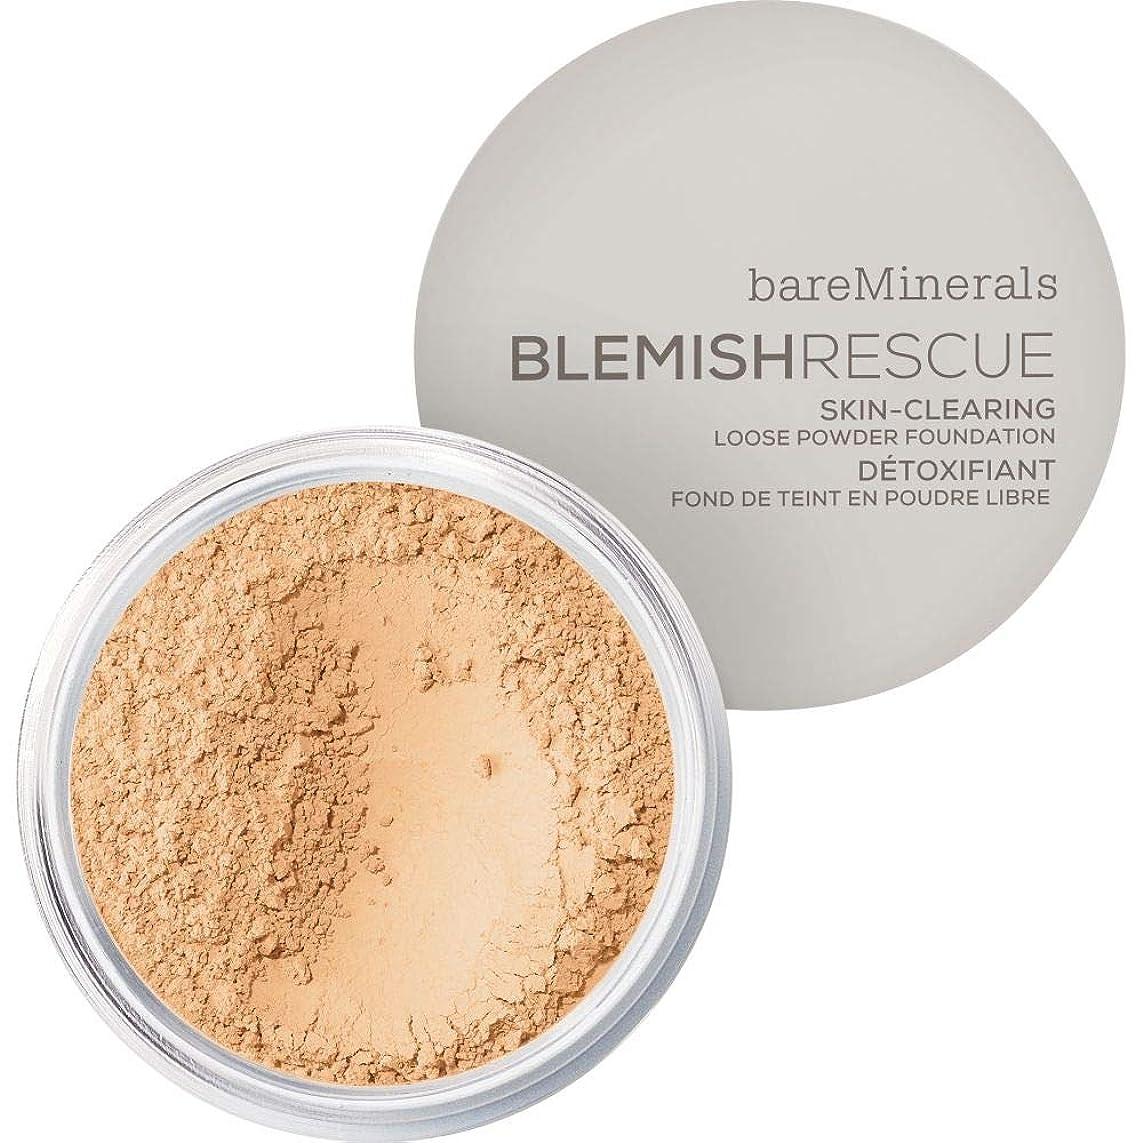 [bareMinerals ] 光 - ベアミネラルは、レスキュースキンクリア2ワットを6G緩いパウダーファンデーションを傷 - bareMinerals Blemish Rescue Skin-Clearing Loose Powder Foundation 6g 2W - Light [並行輸入品]